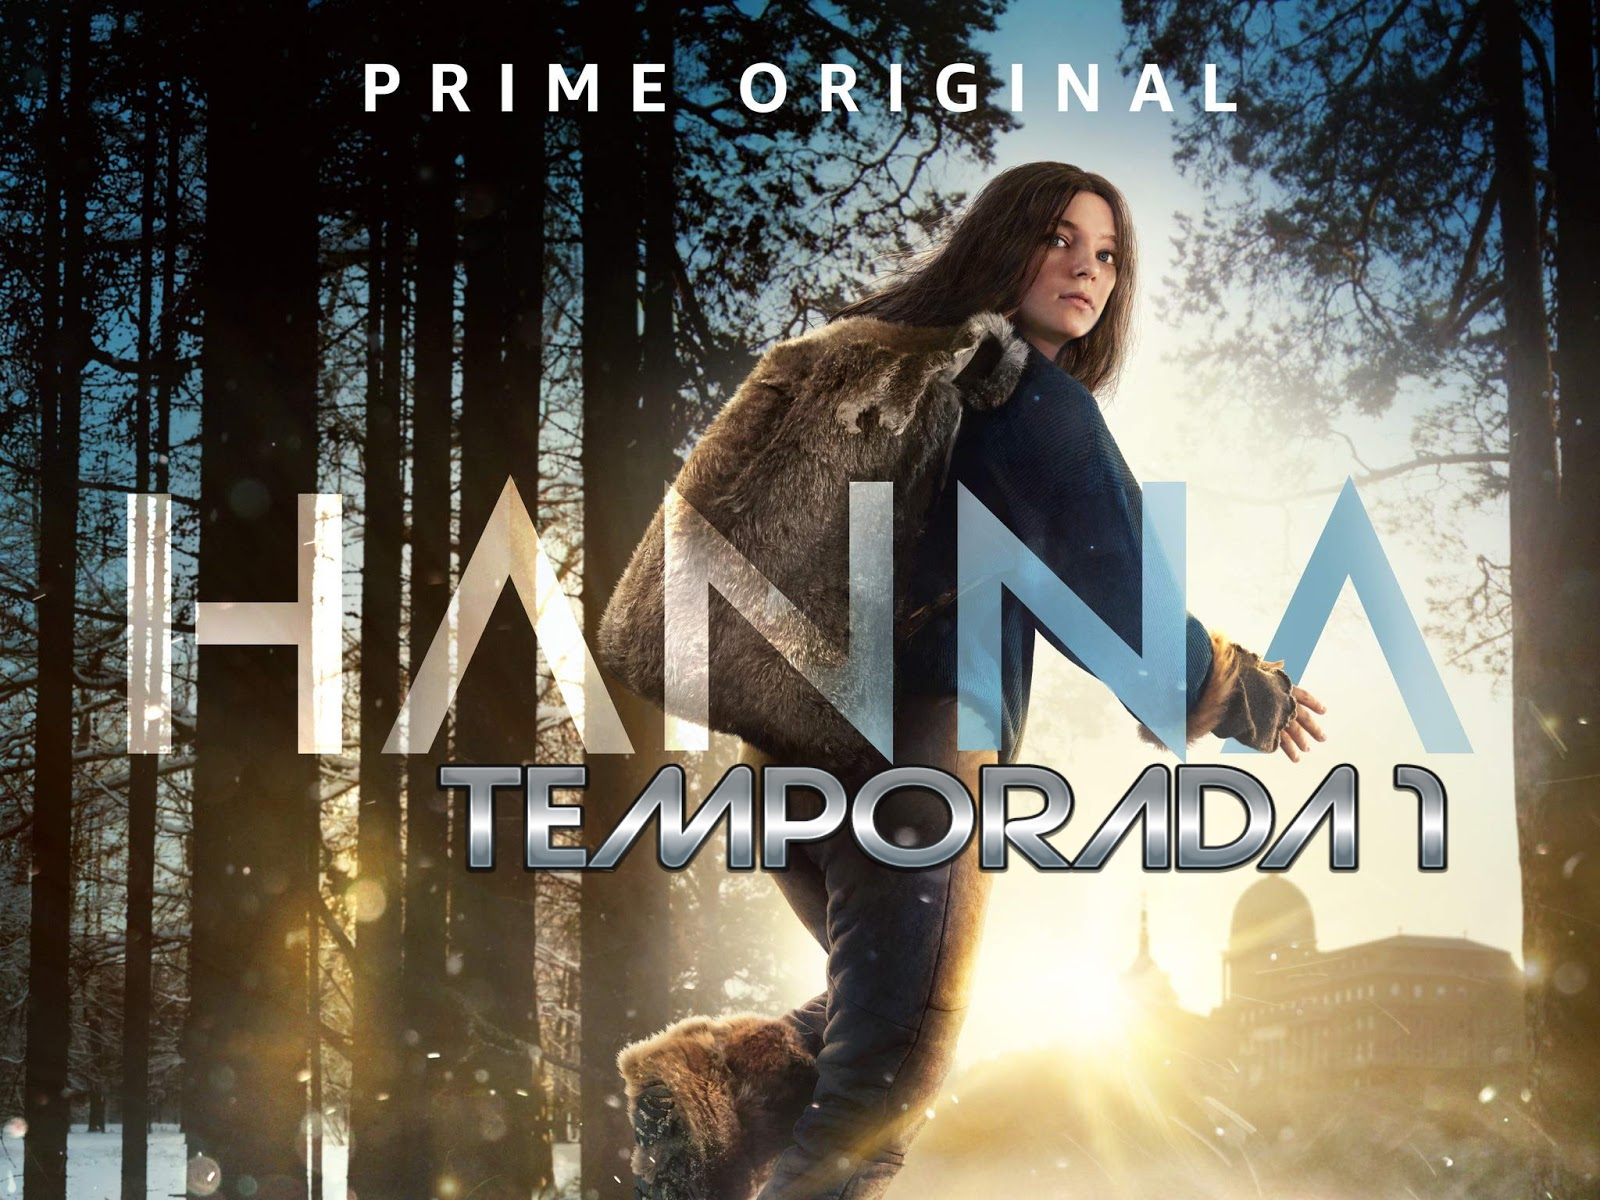 Hanna (TEMPORADA 1) WEB-DL 1080P LATINO/INGLES